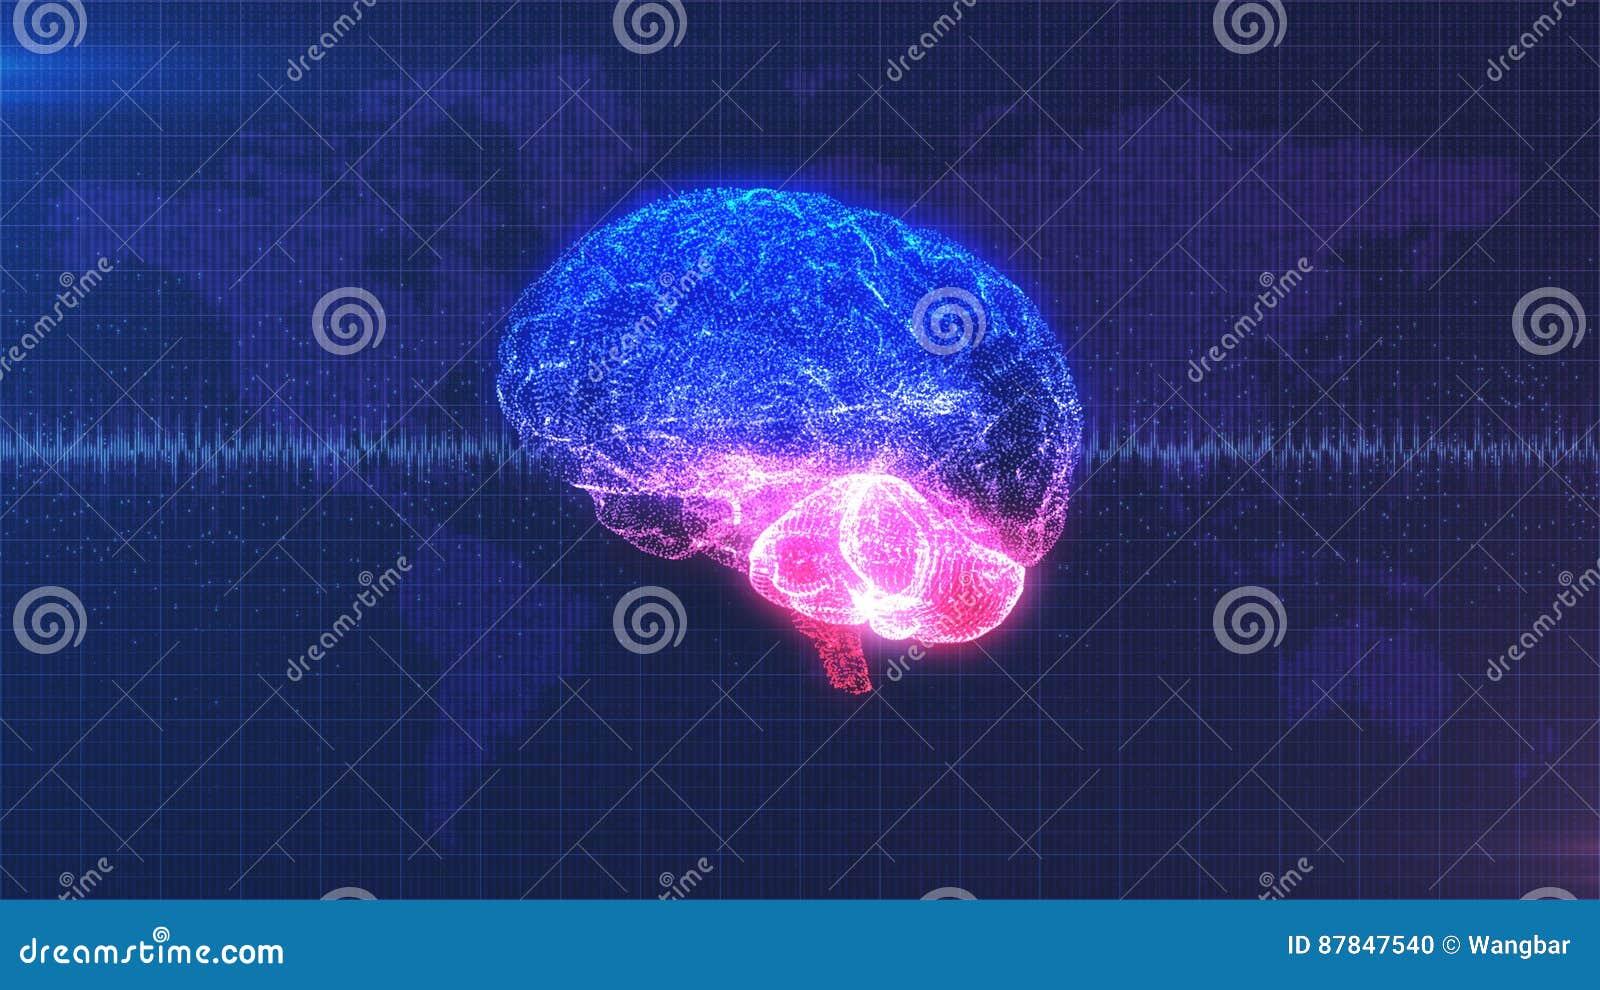 Brain computer image - digital pink, purple and blue brain with brainwave animation